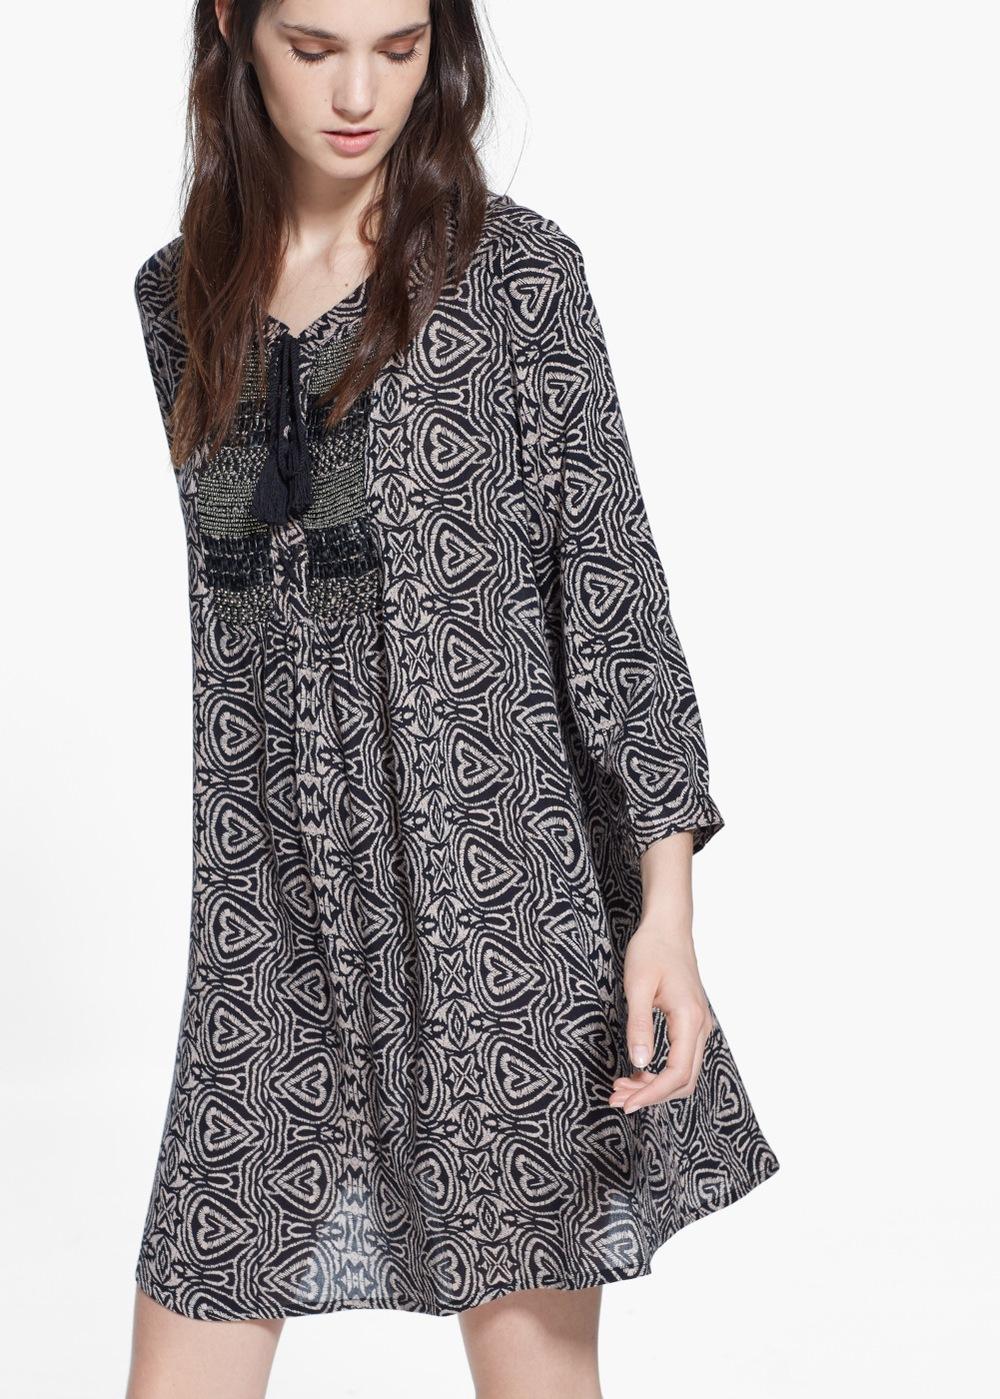 Beaded panel Dress , $39.99